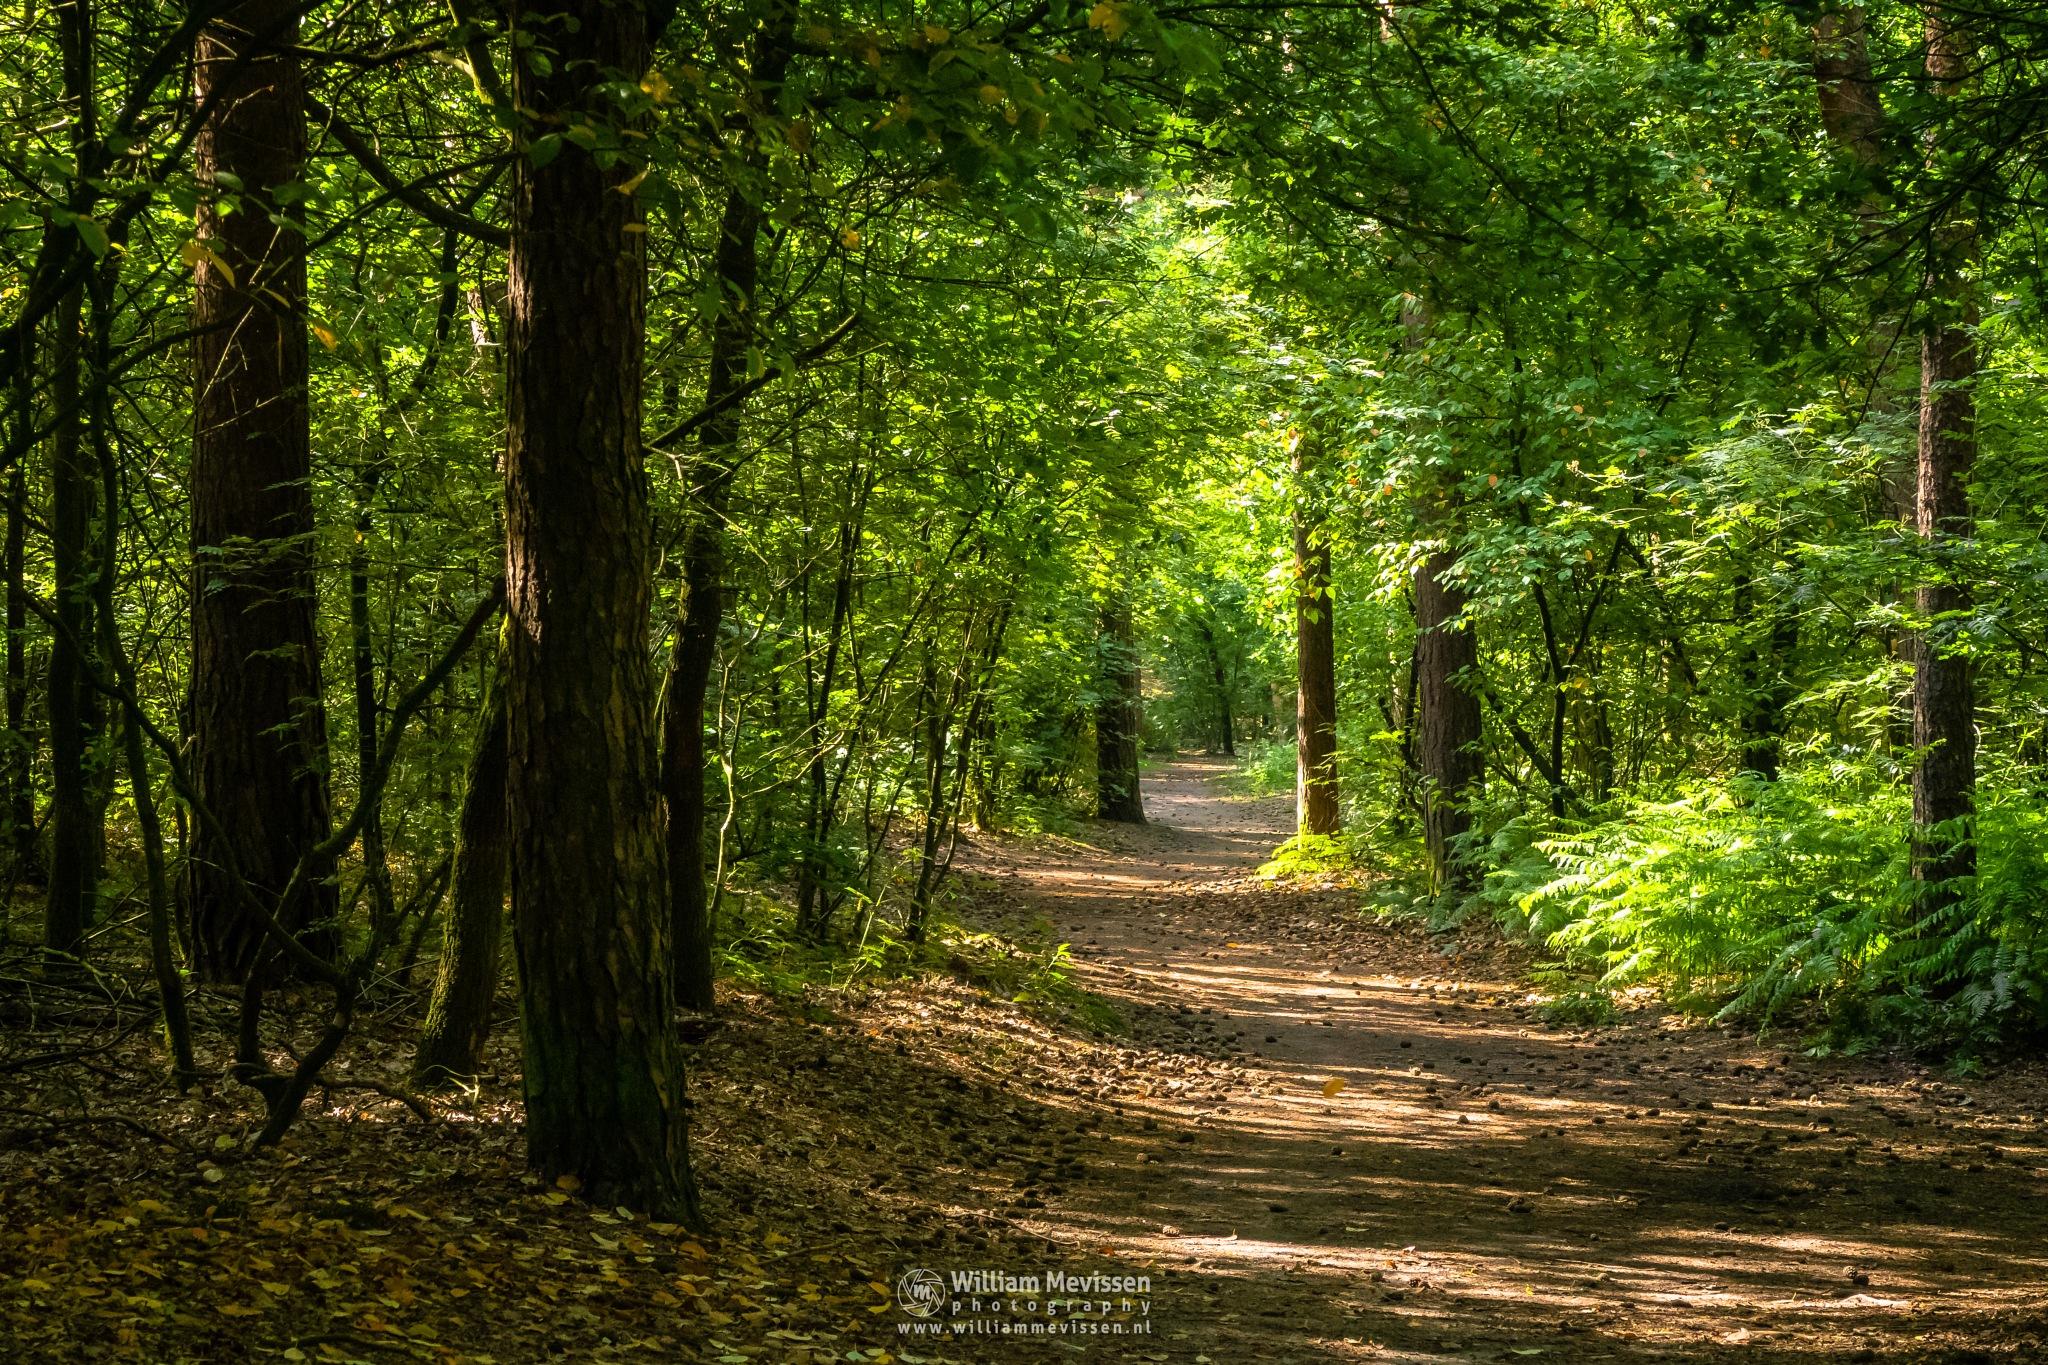 Sunny Path Vlakwater by William Mevissen